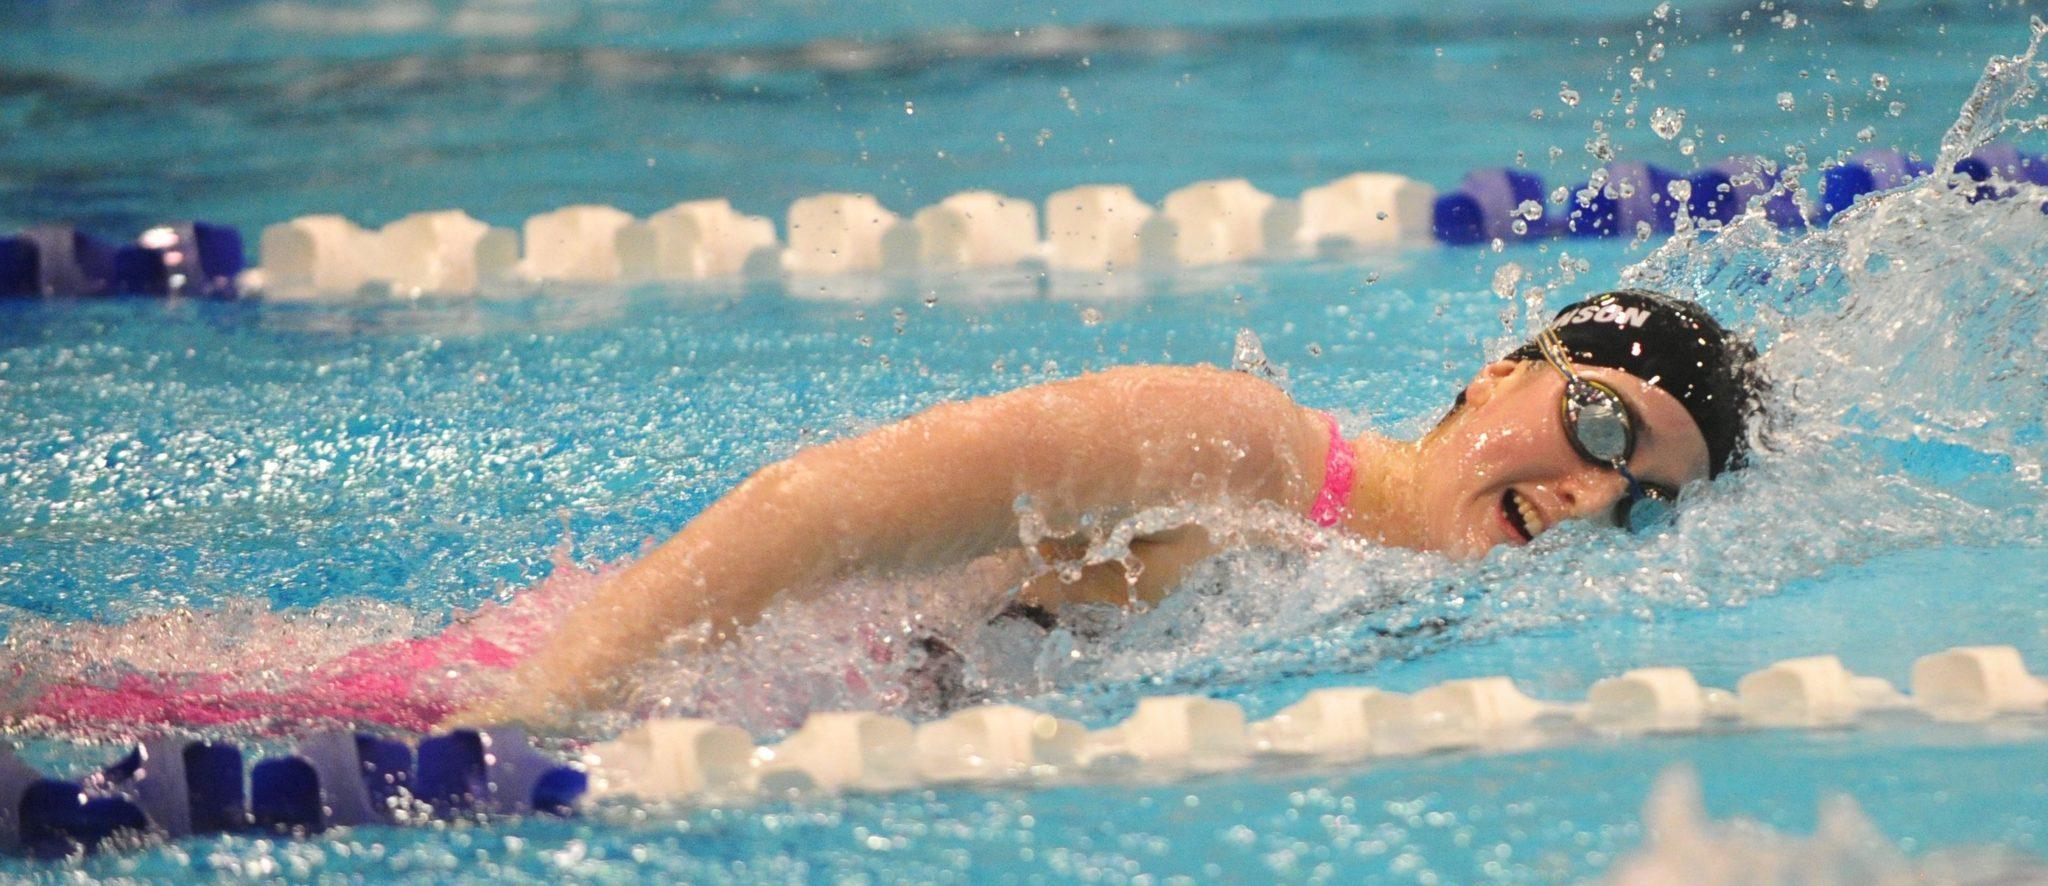 Elizabeth Stinson Swim Jobs Love Swimswam